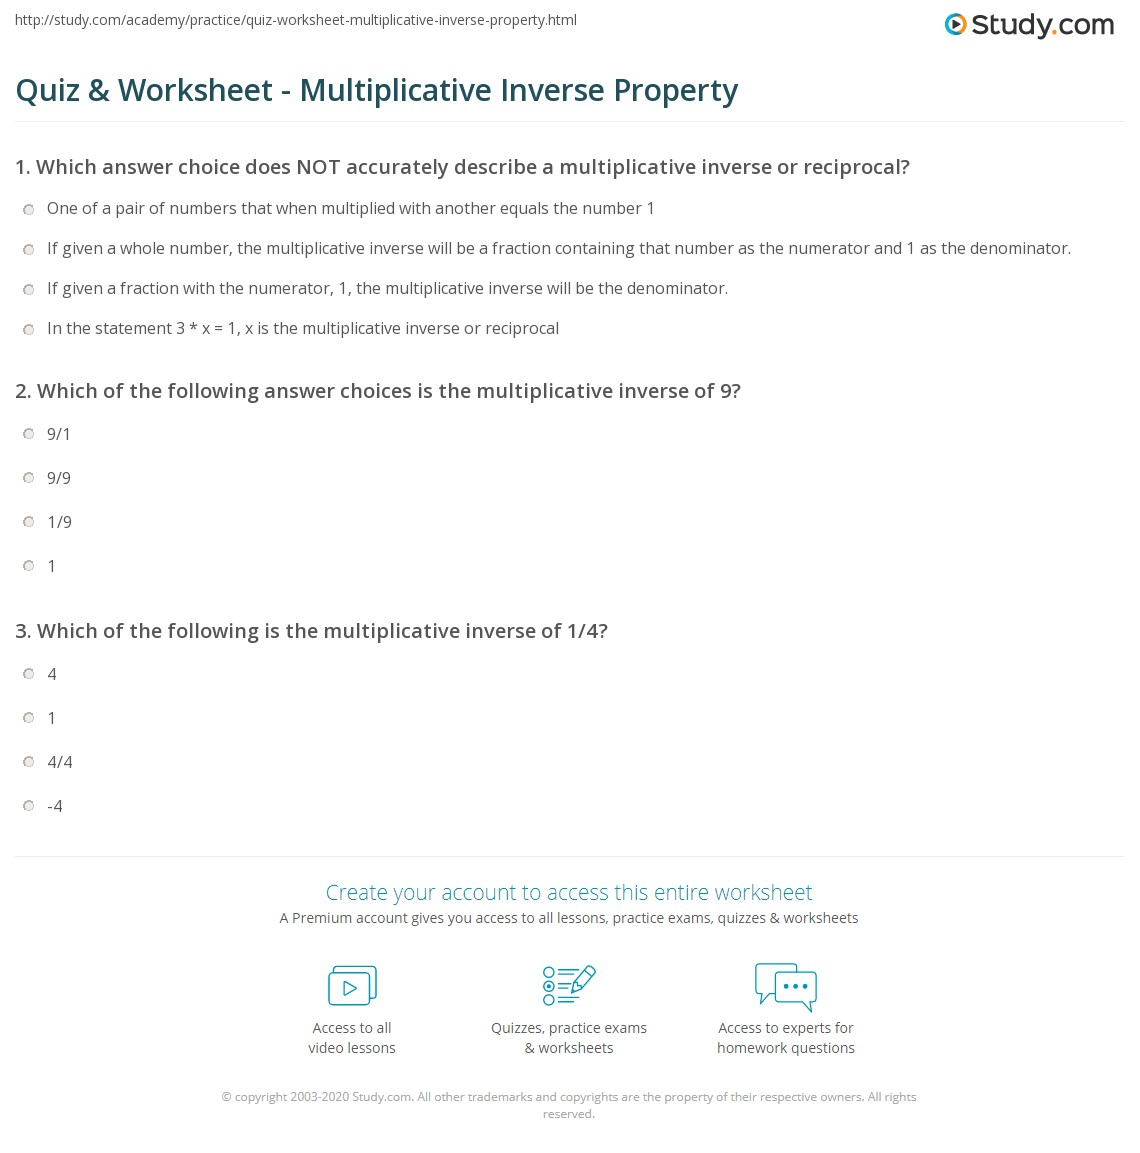 Quiz W Ksheet Multiplic Tive Verse Property Study